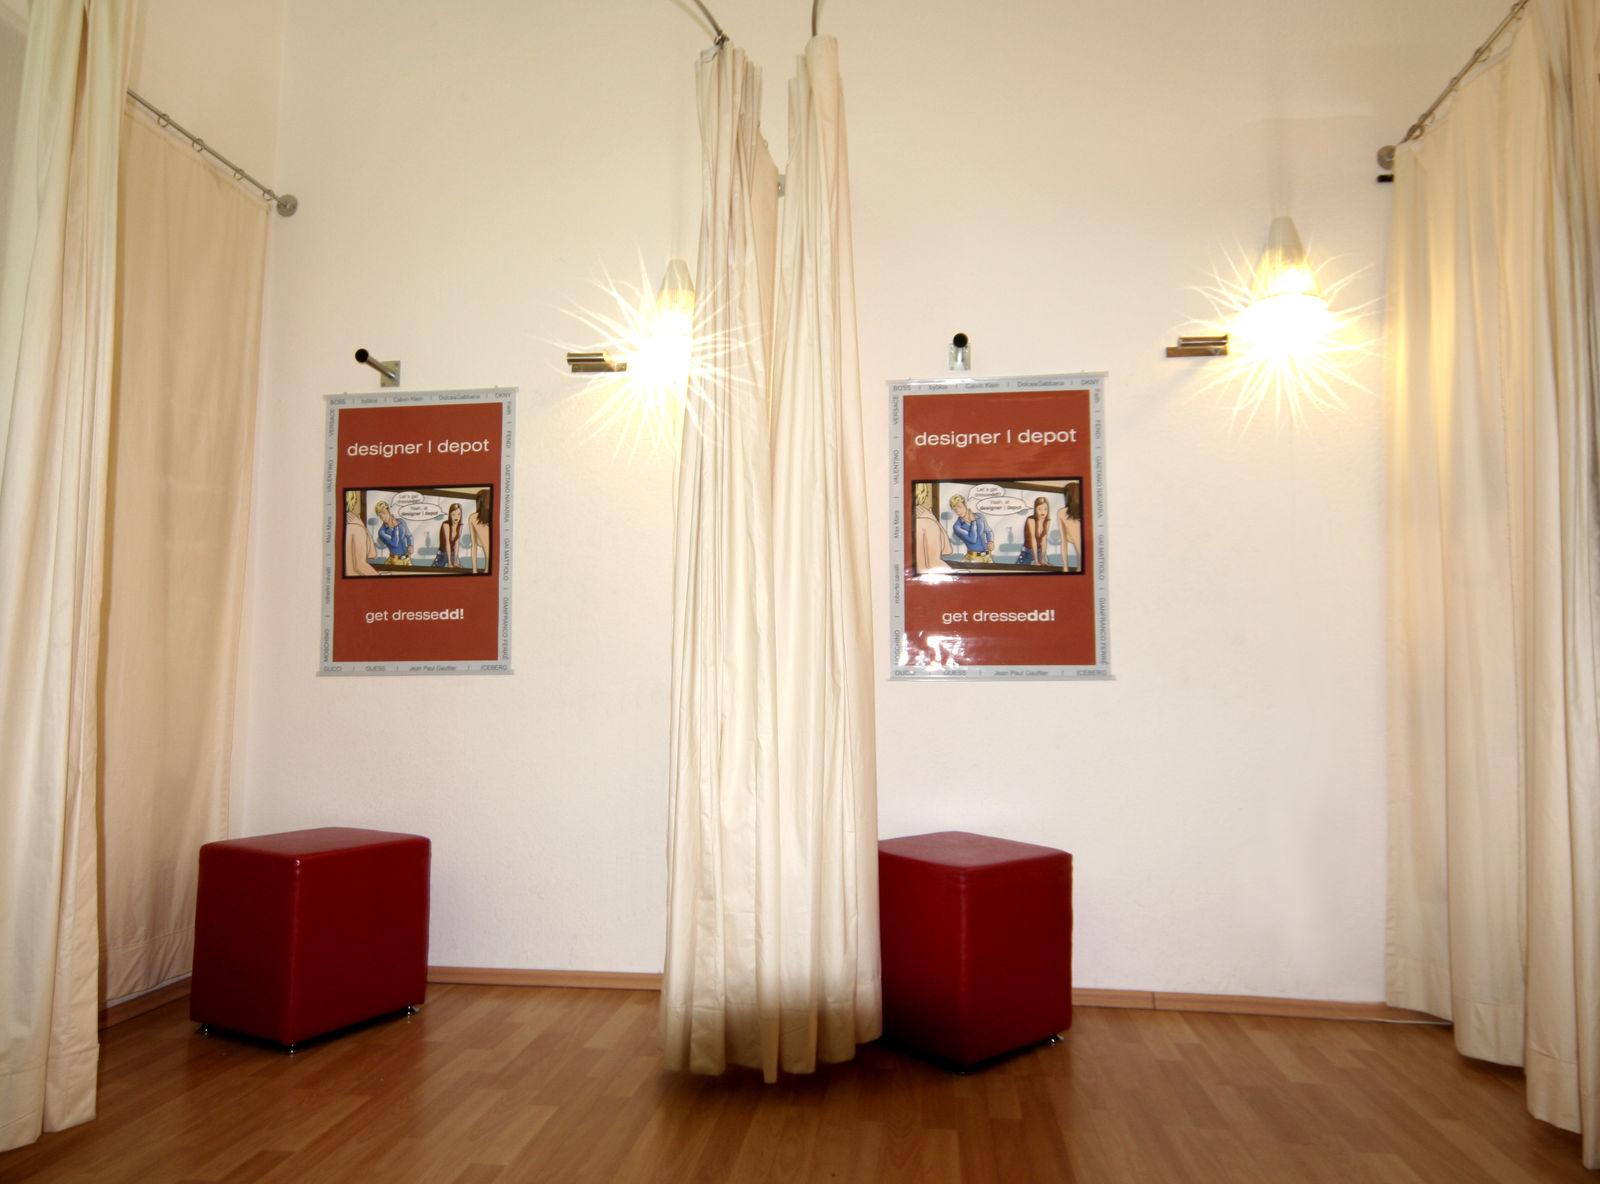 Designer Depot in Berlin (Bild 8)